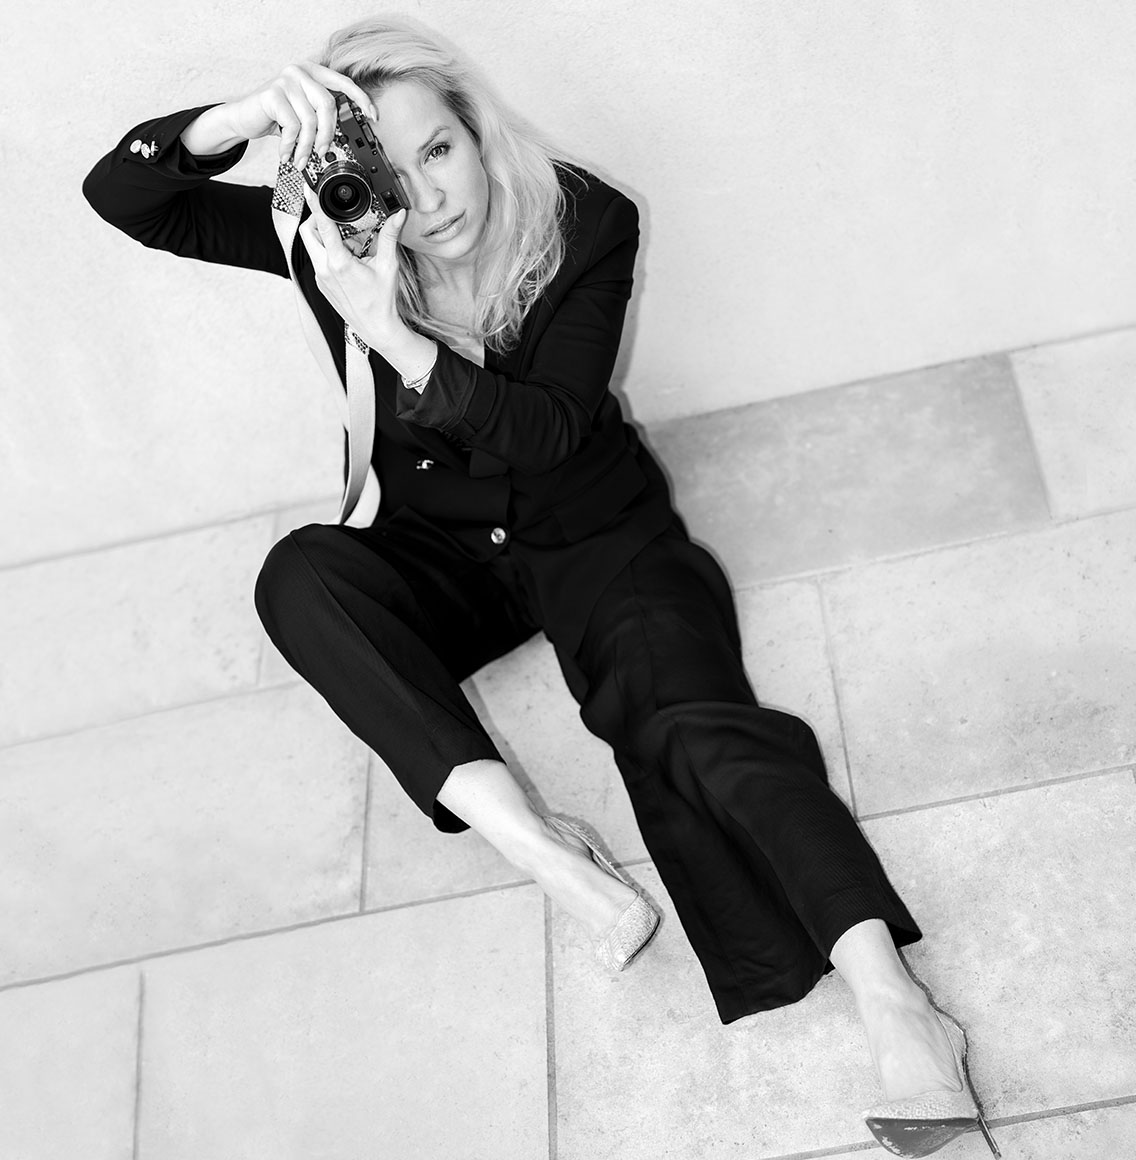 angelina bertrand - silvergumtype photographers blog